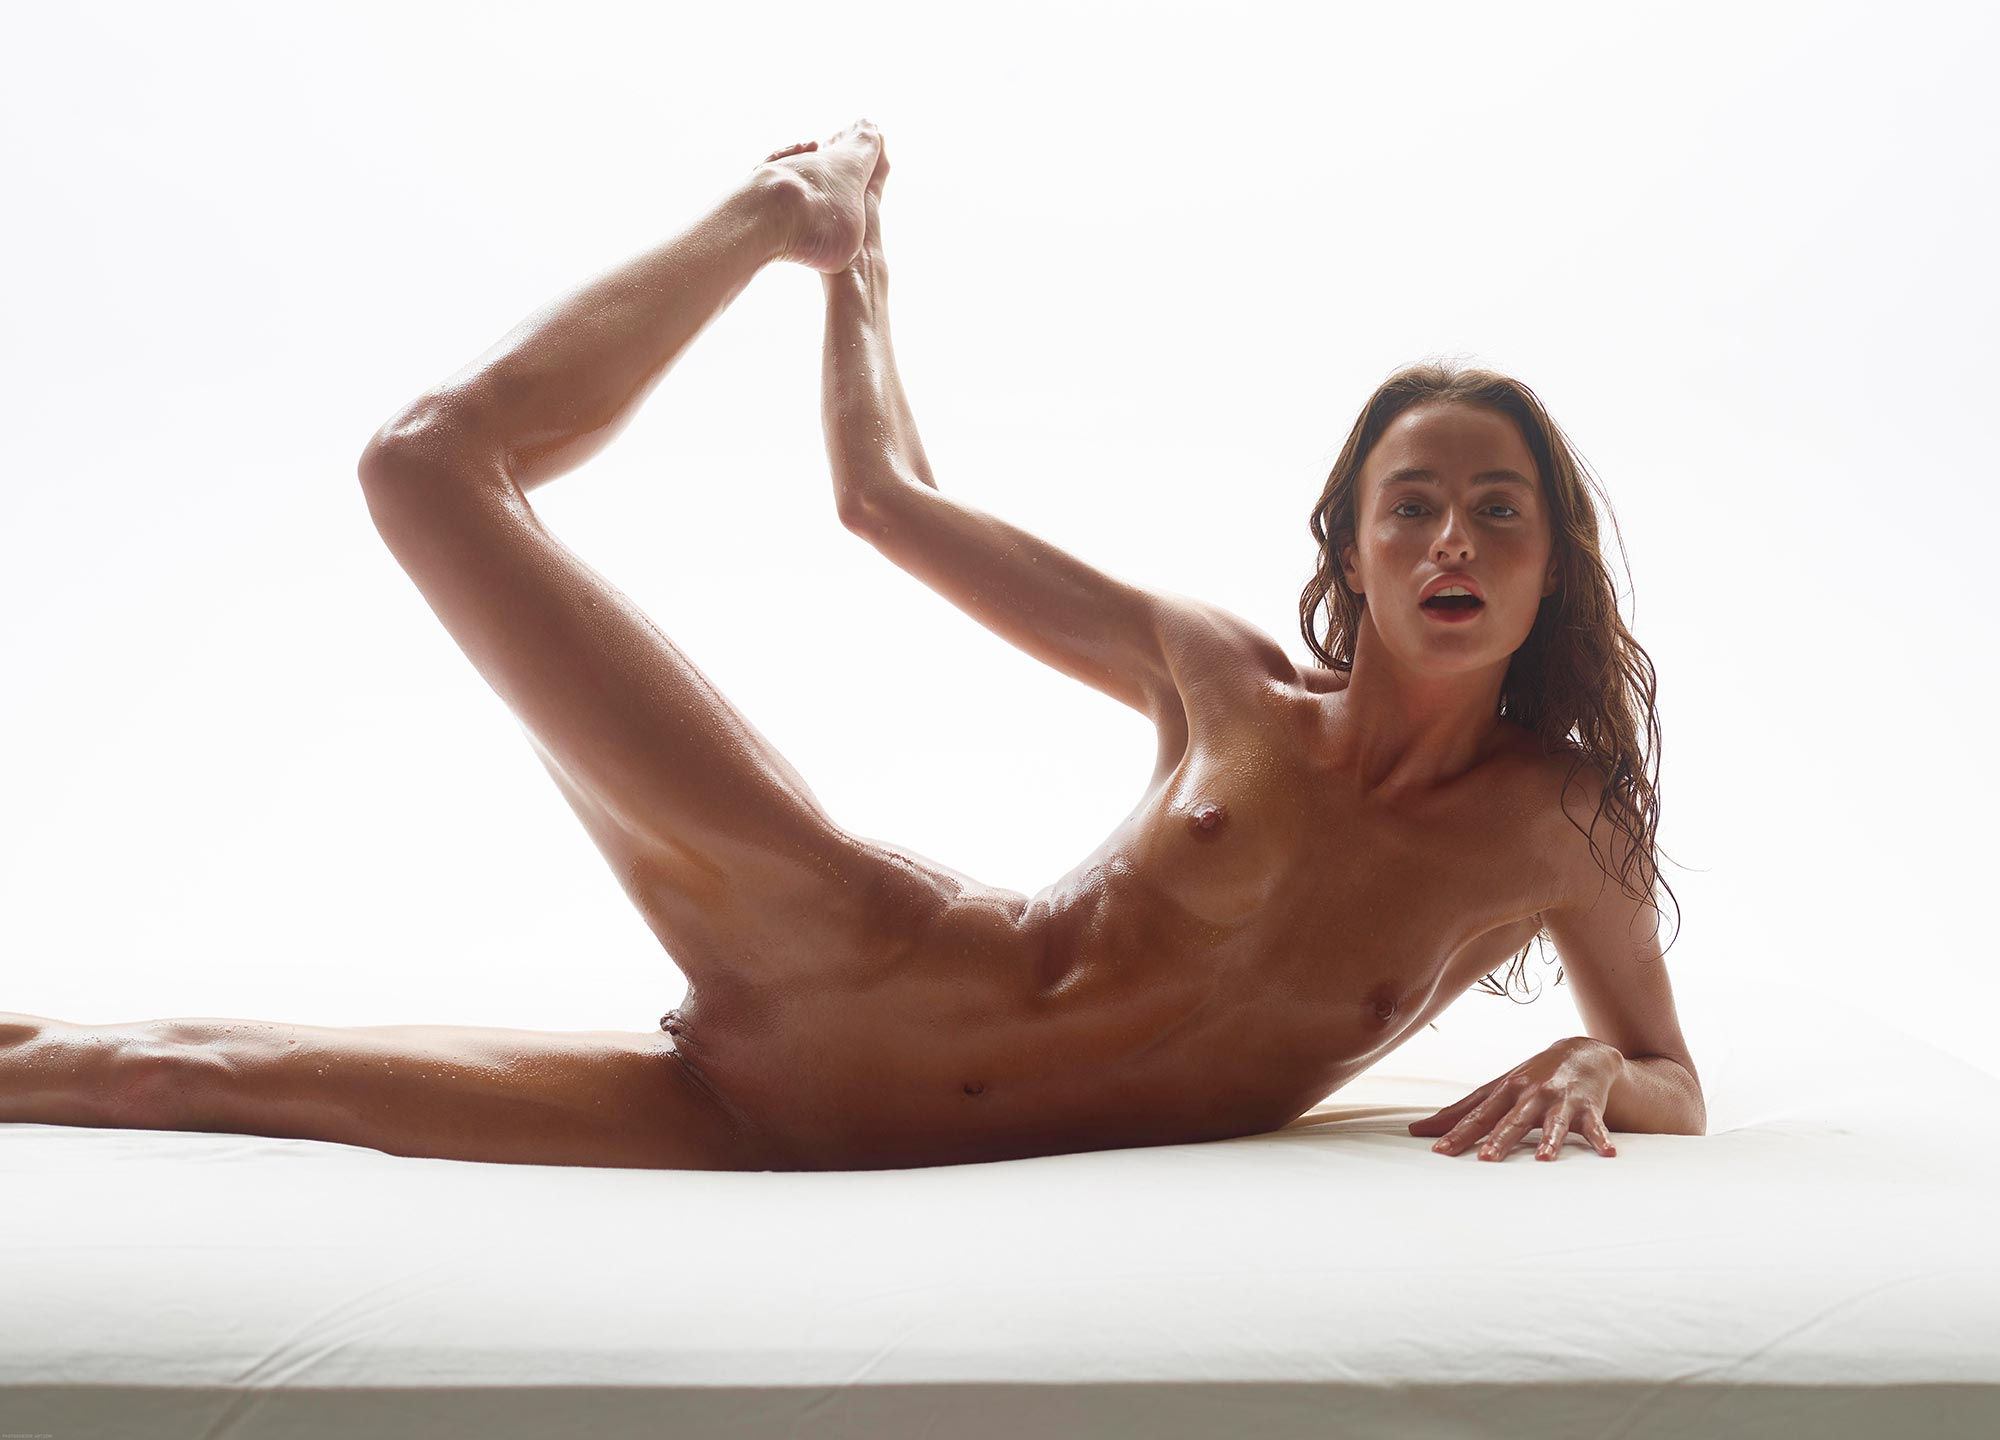 Nude Yoga Porn Videos Free Sex Tube  xHamster